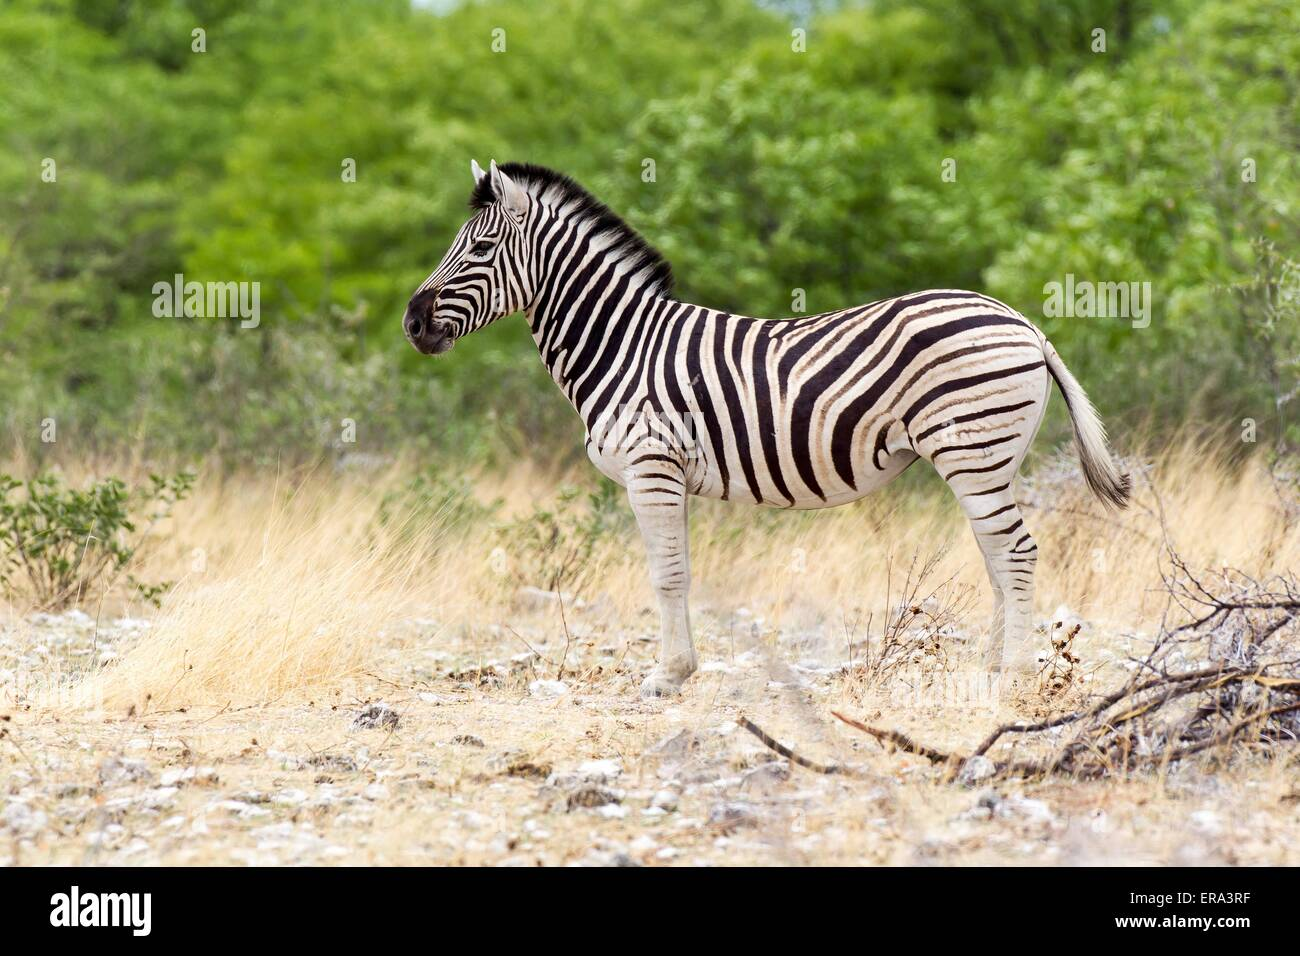 plains zebra - Stock Image